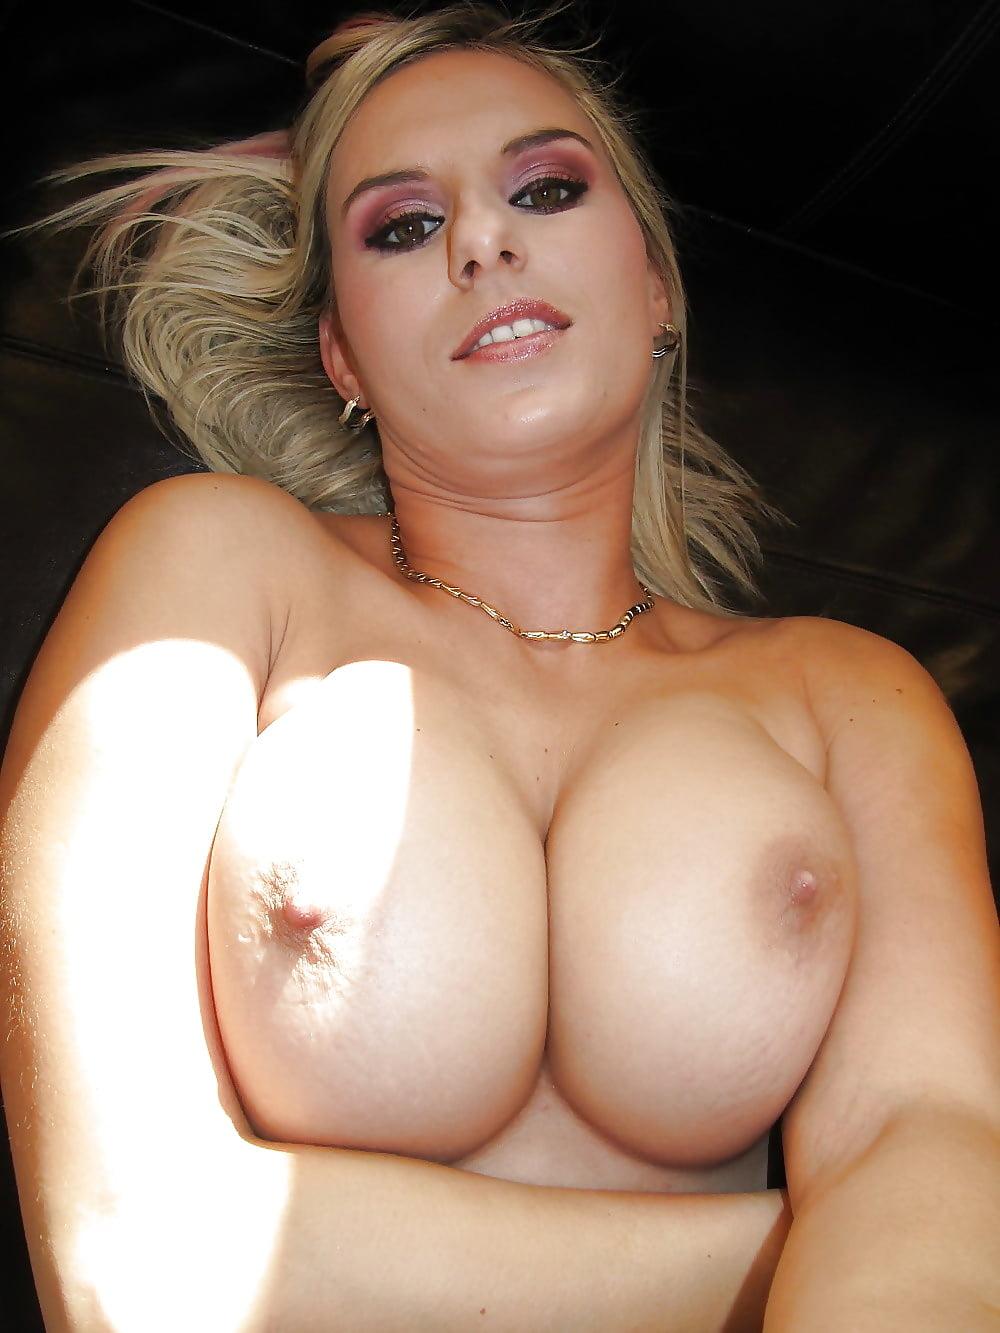 Amateur beautiful blonde milf nude and hard